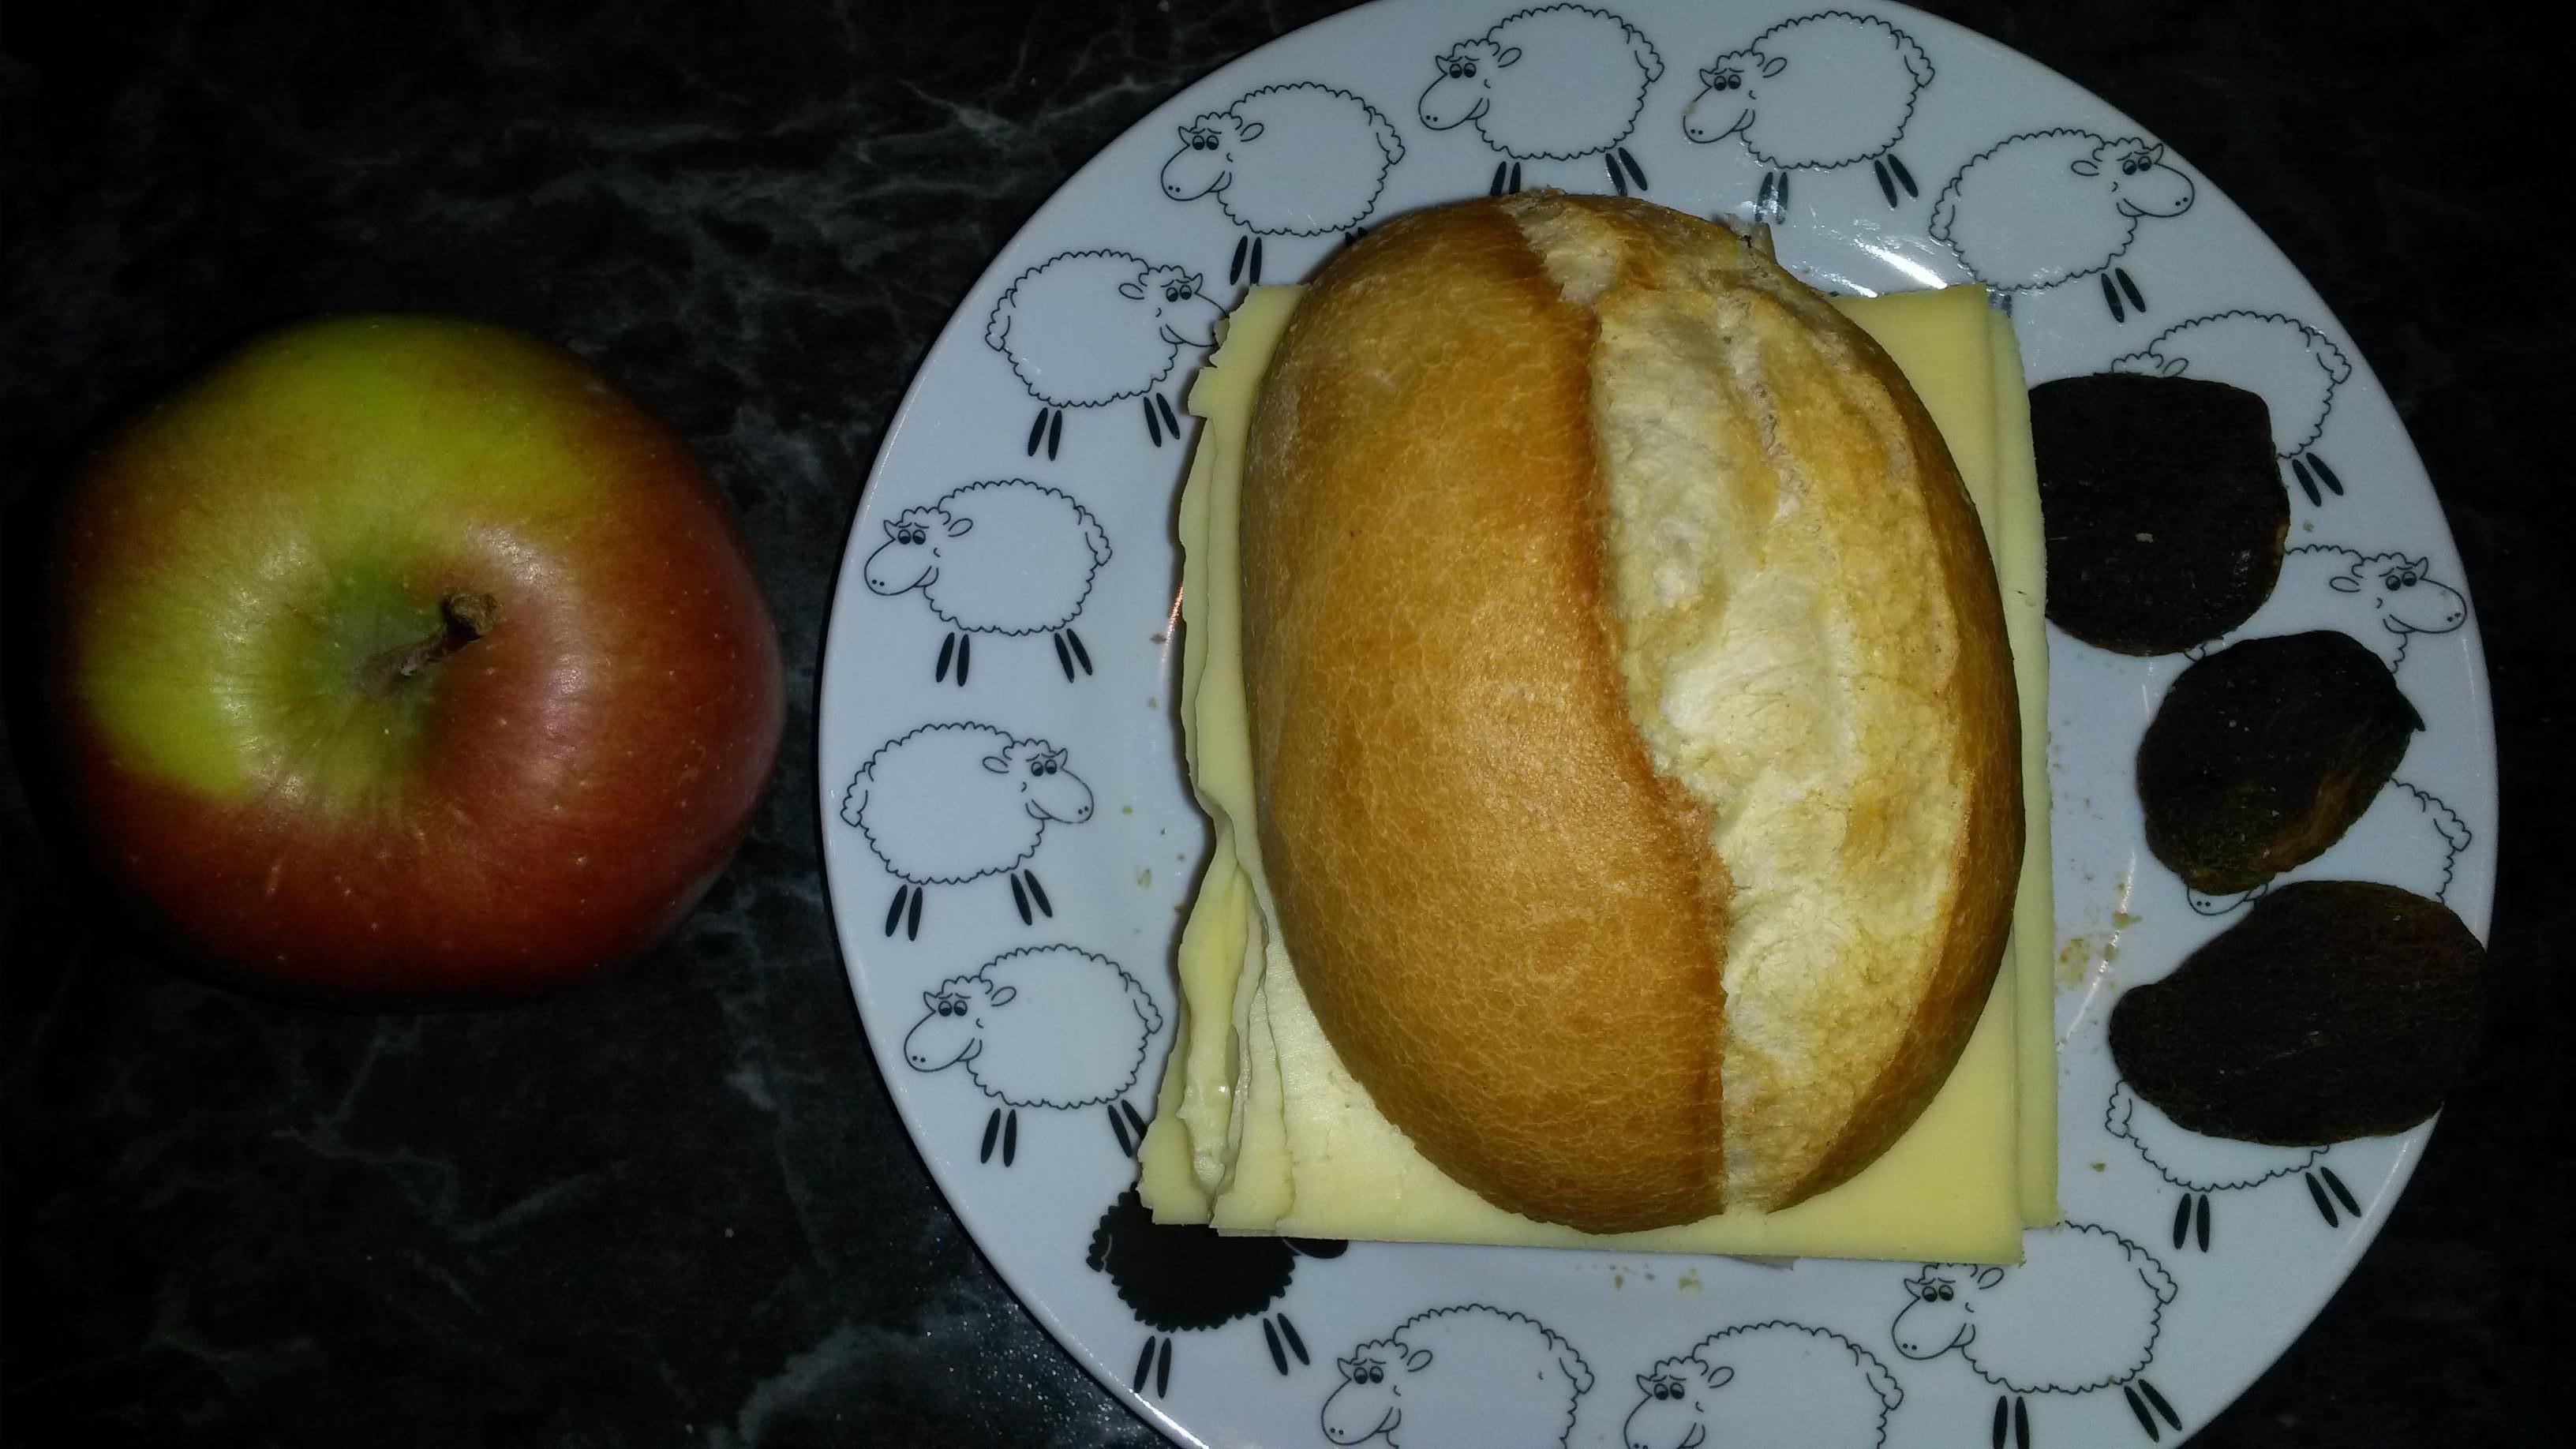 https://foodloader.net/sk0r_2014-02-21_Kaesebroetchen_und_Obst.jpg